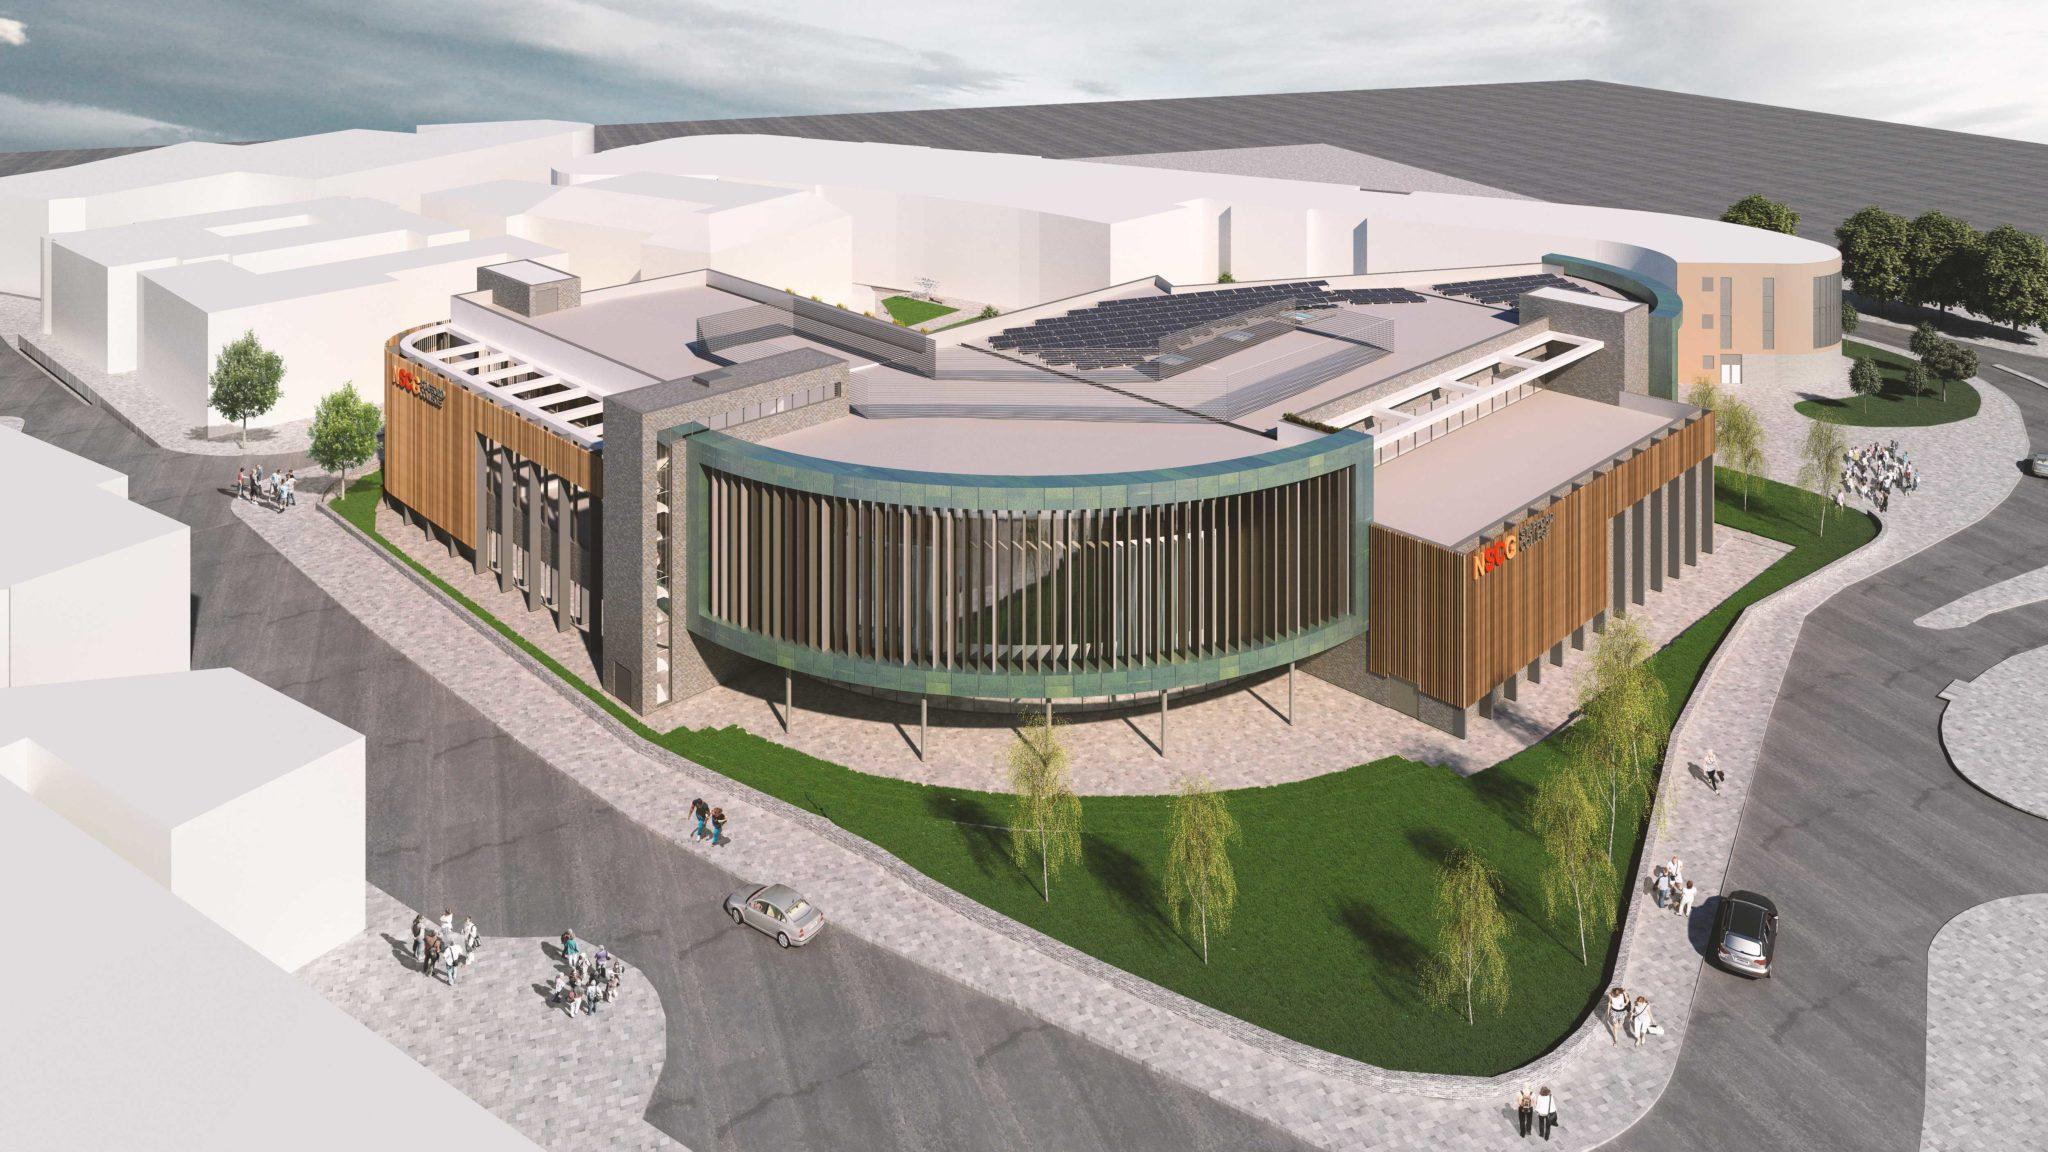 Stafford College Skills and Innovation Hub